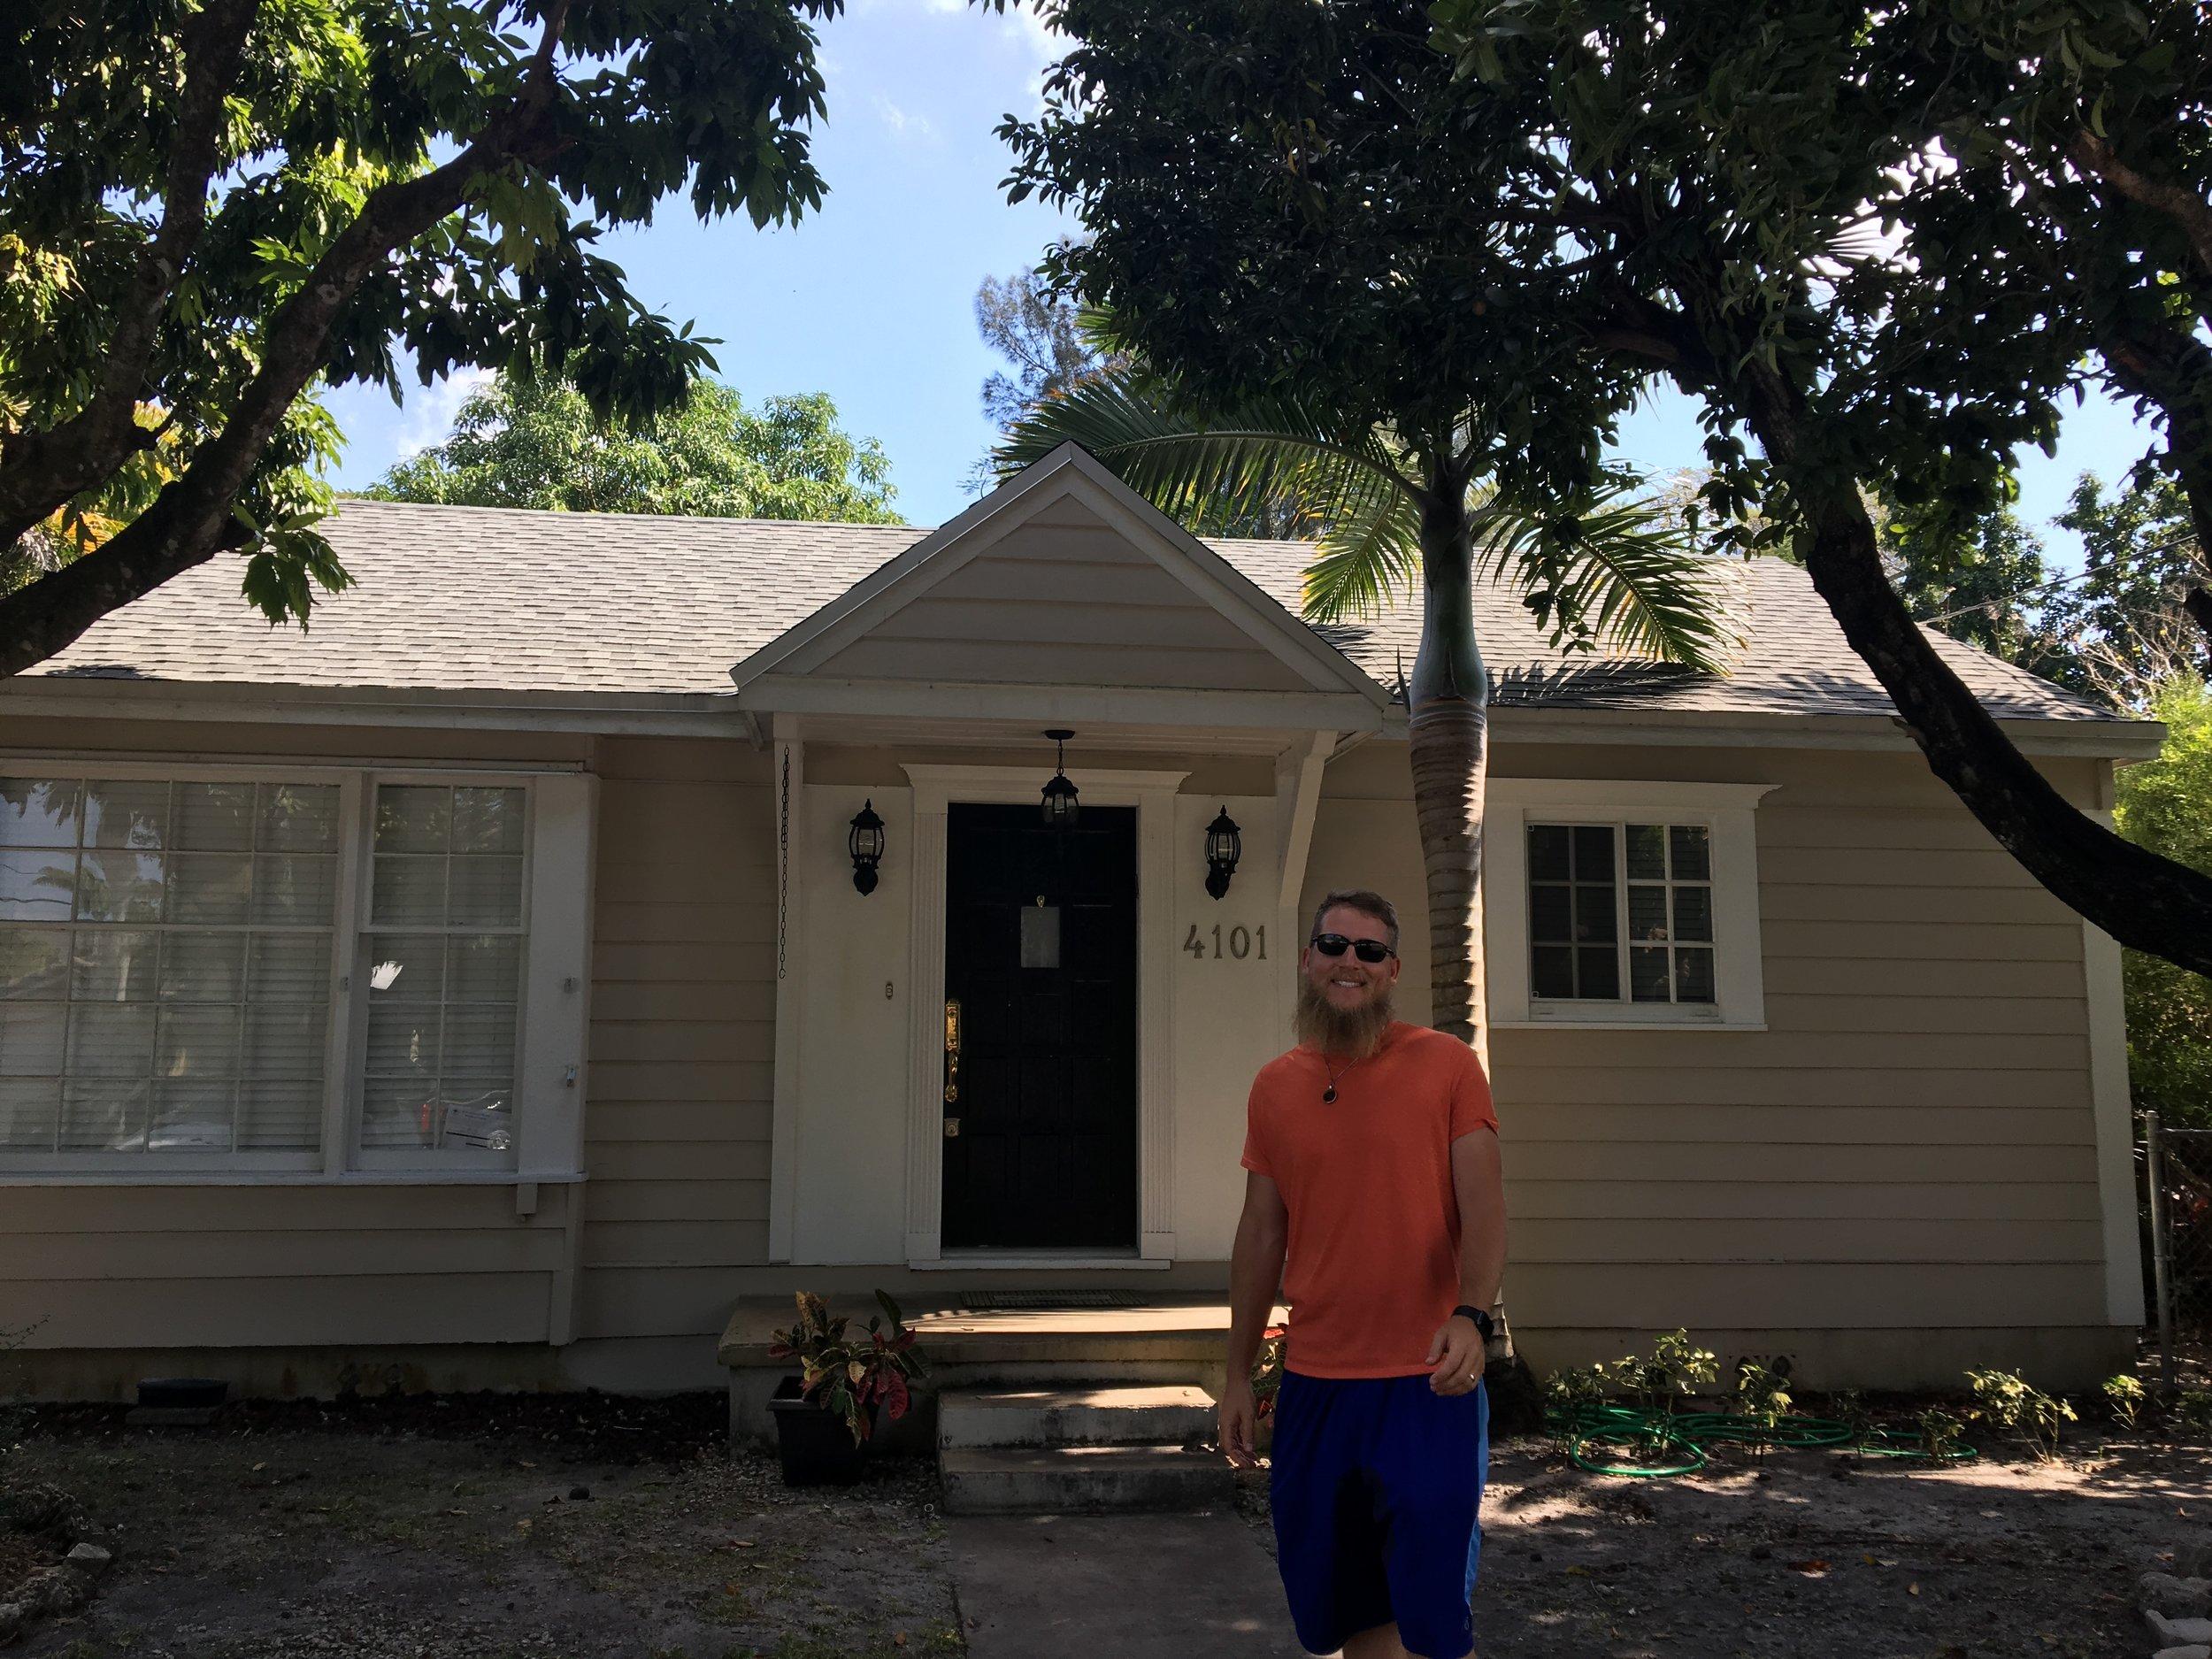 Dylan's Senior year house